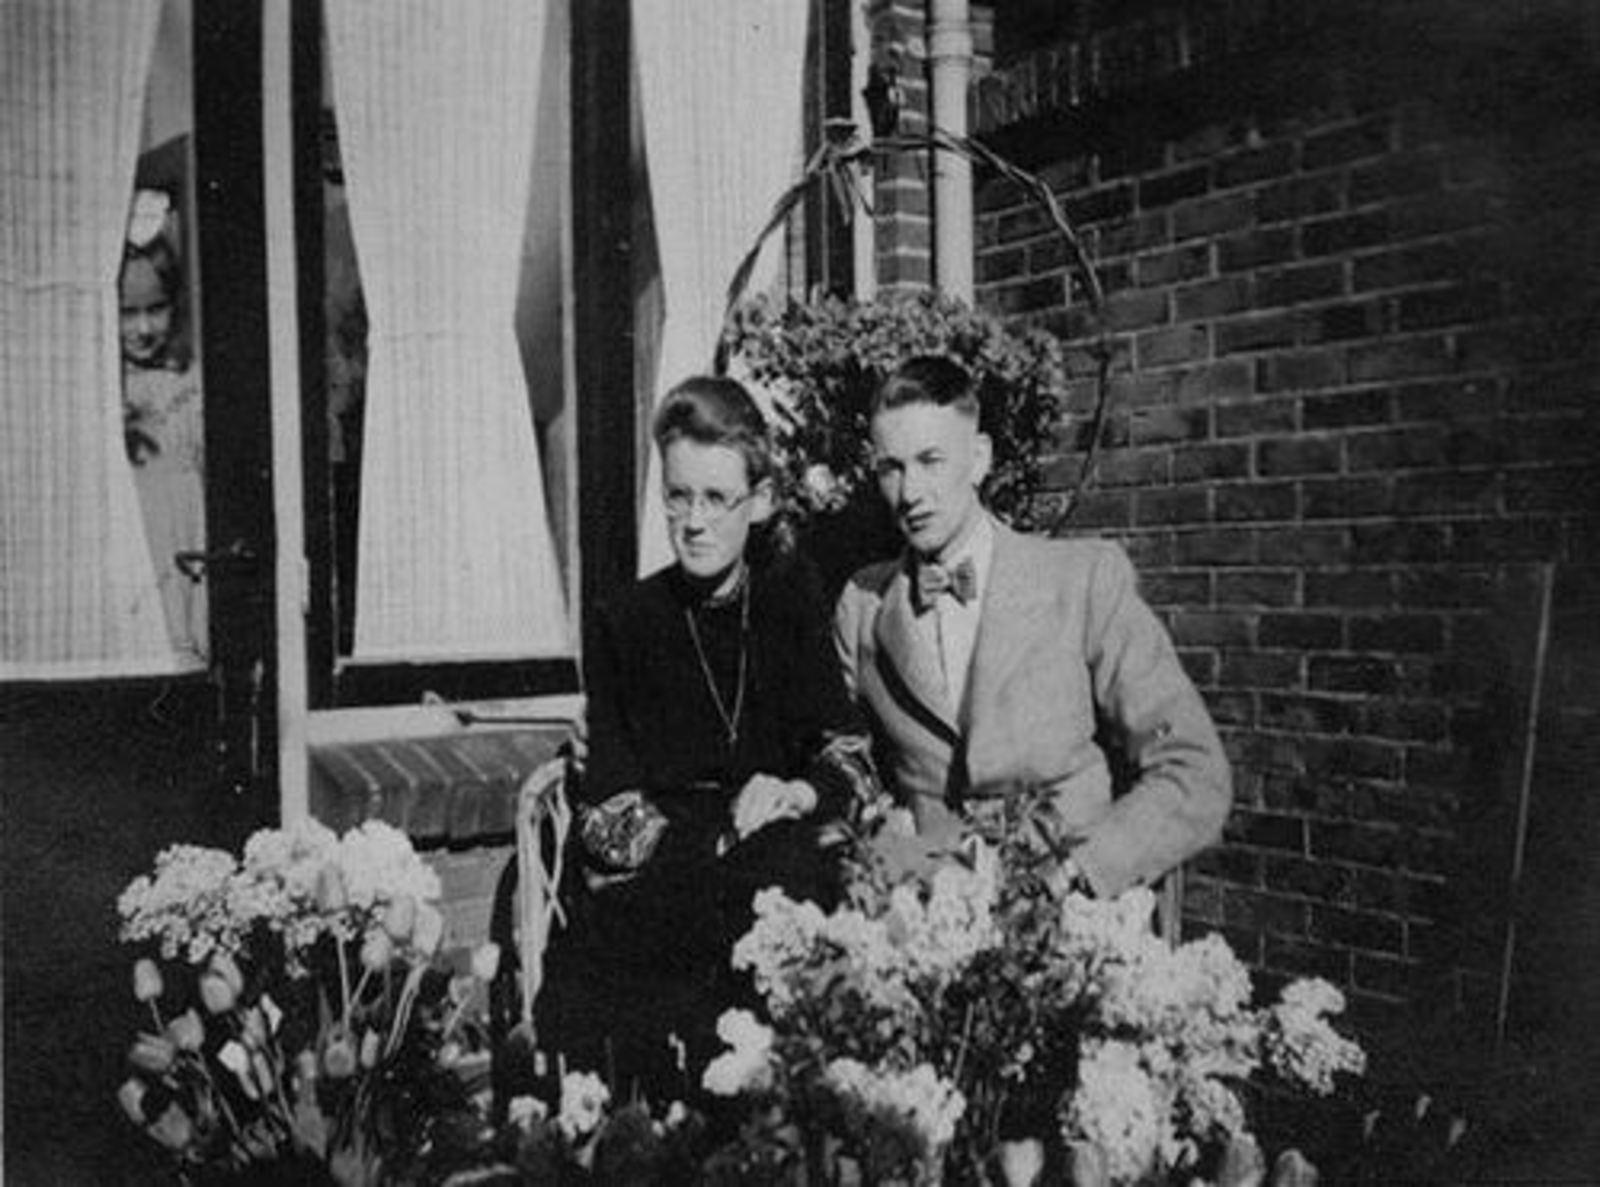 Bax Jo 1942 verloving met Nel Boon 02 Onbekend